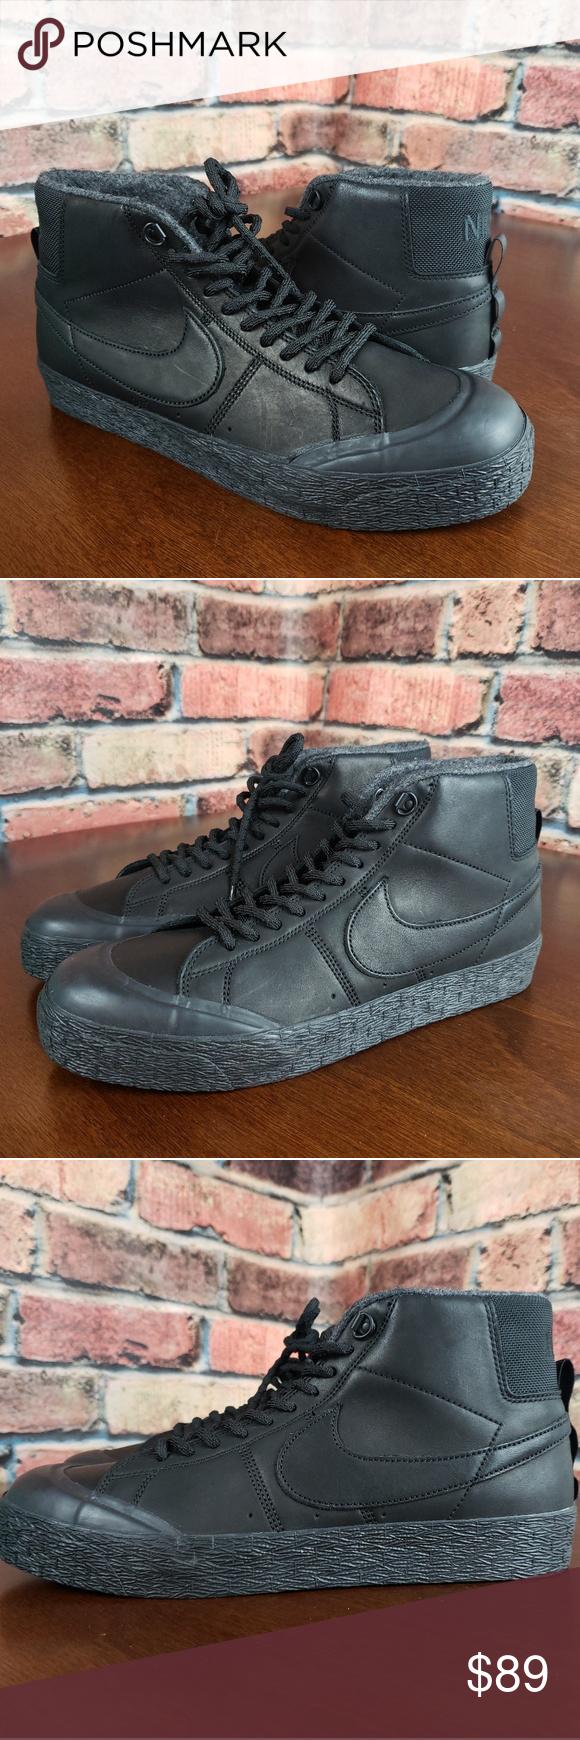 hot sales 6bedc dcec7 💣 Nike SB Blazer Zoom M XT Bota Brand new with box with no ...